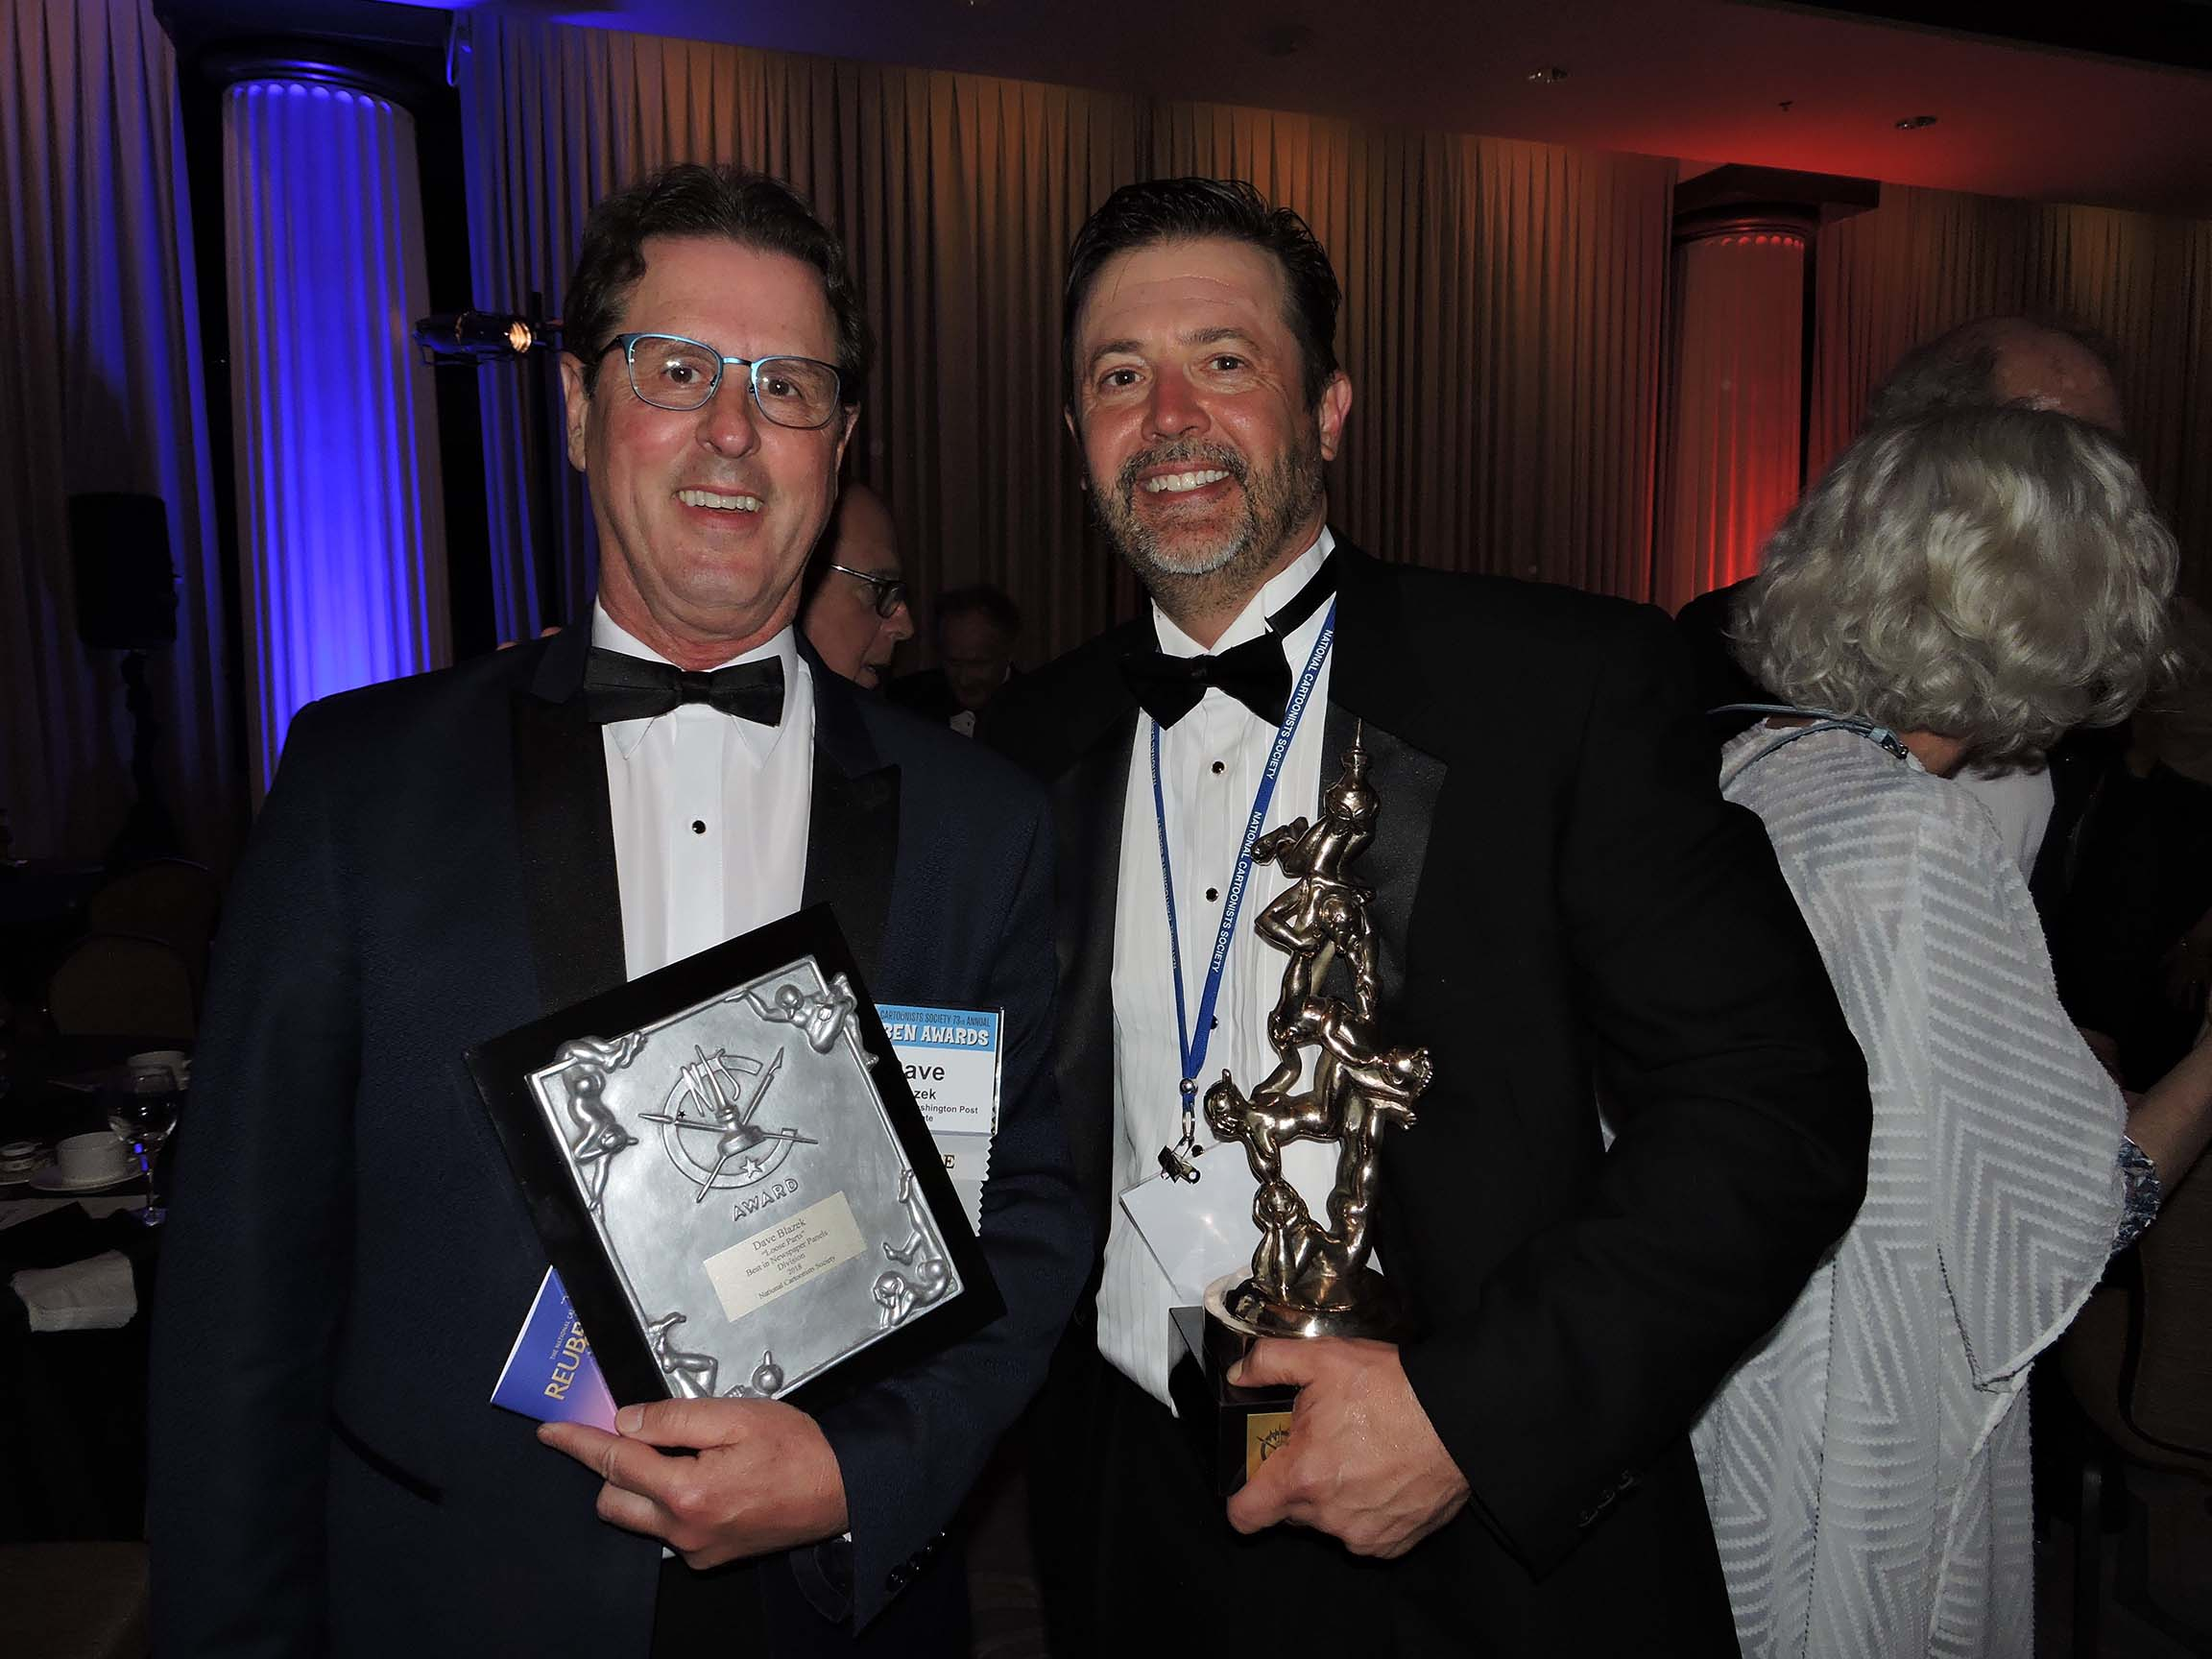 Dave Blazek (left) and Stephan Pastis...